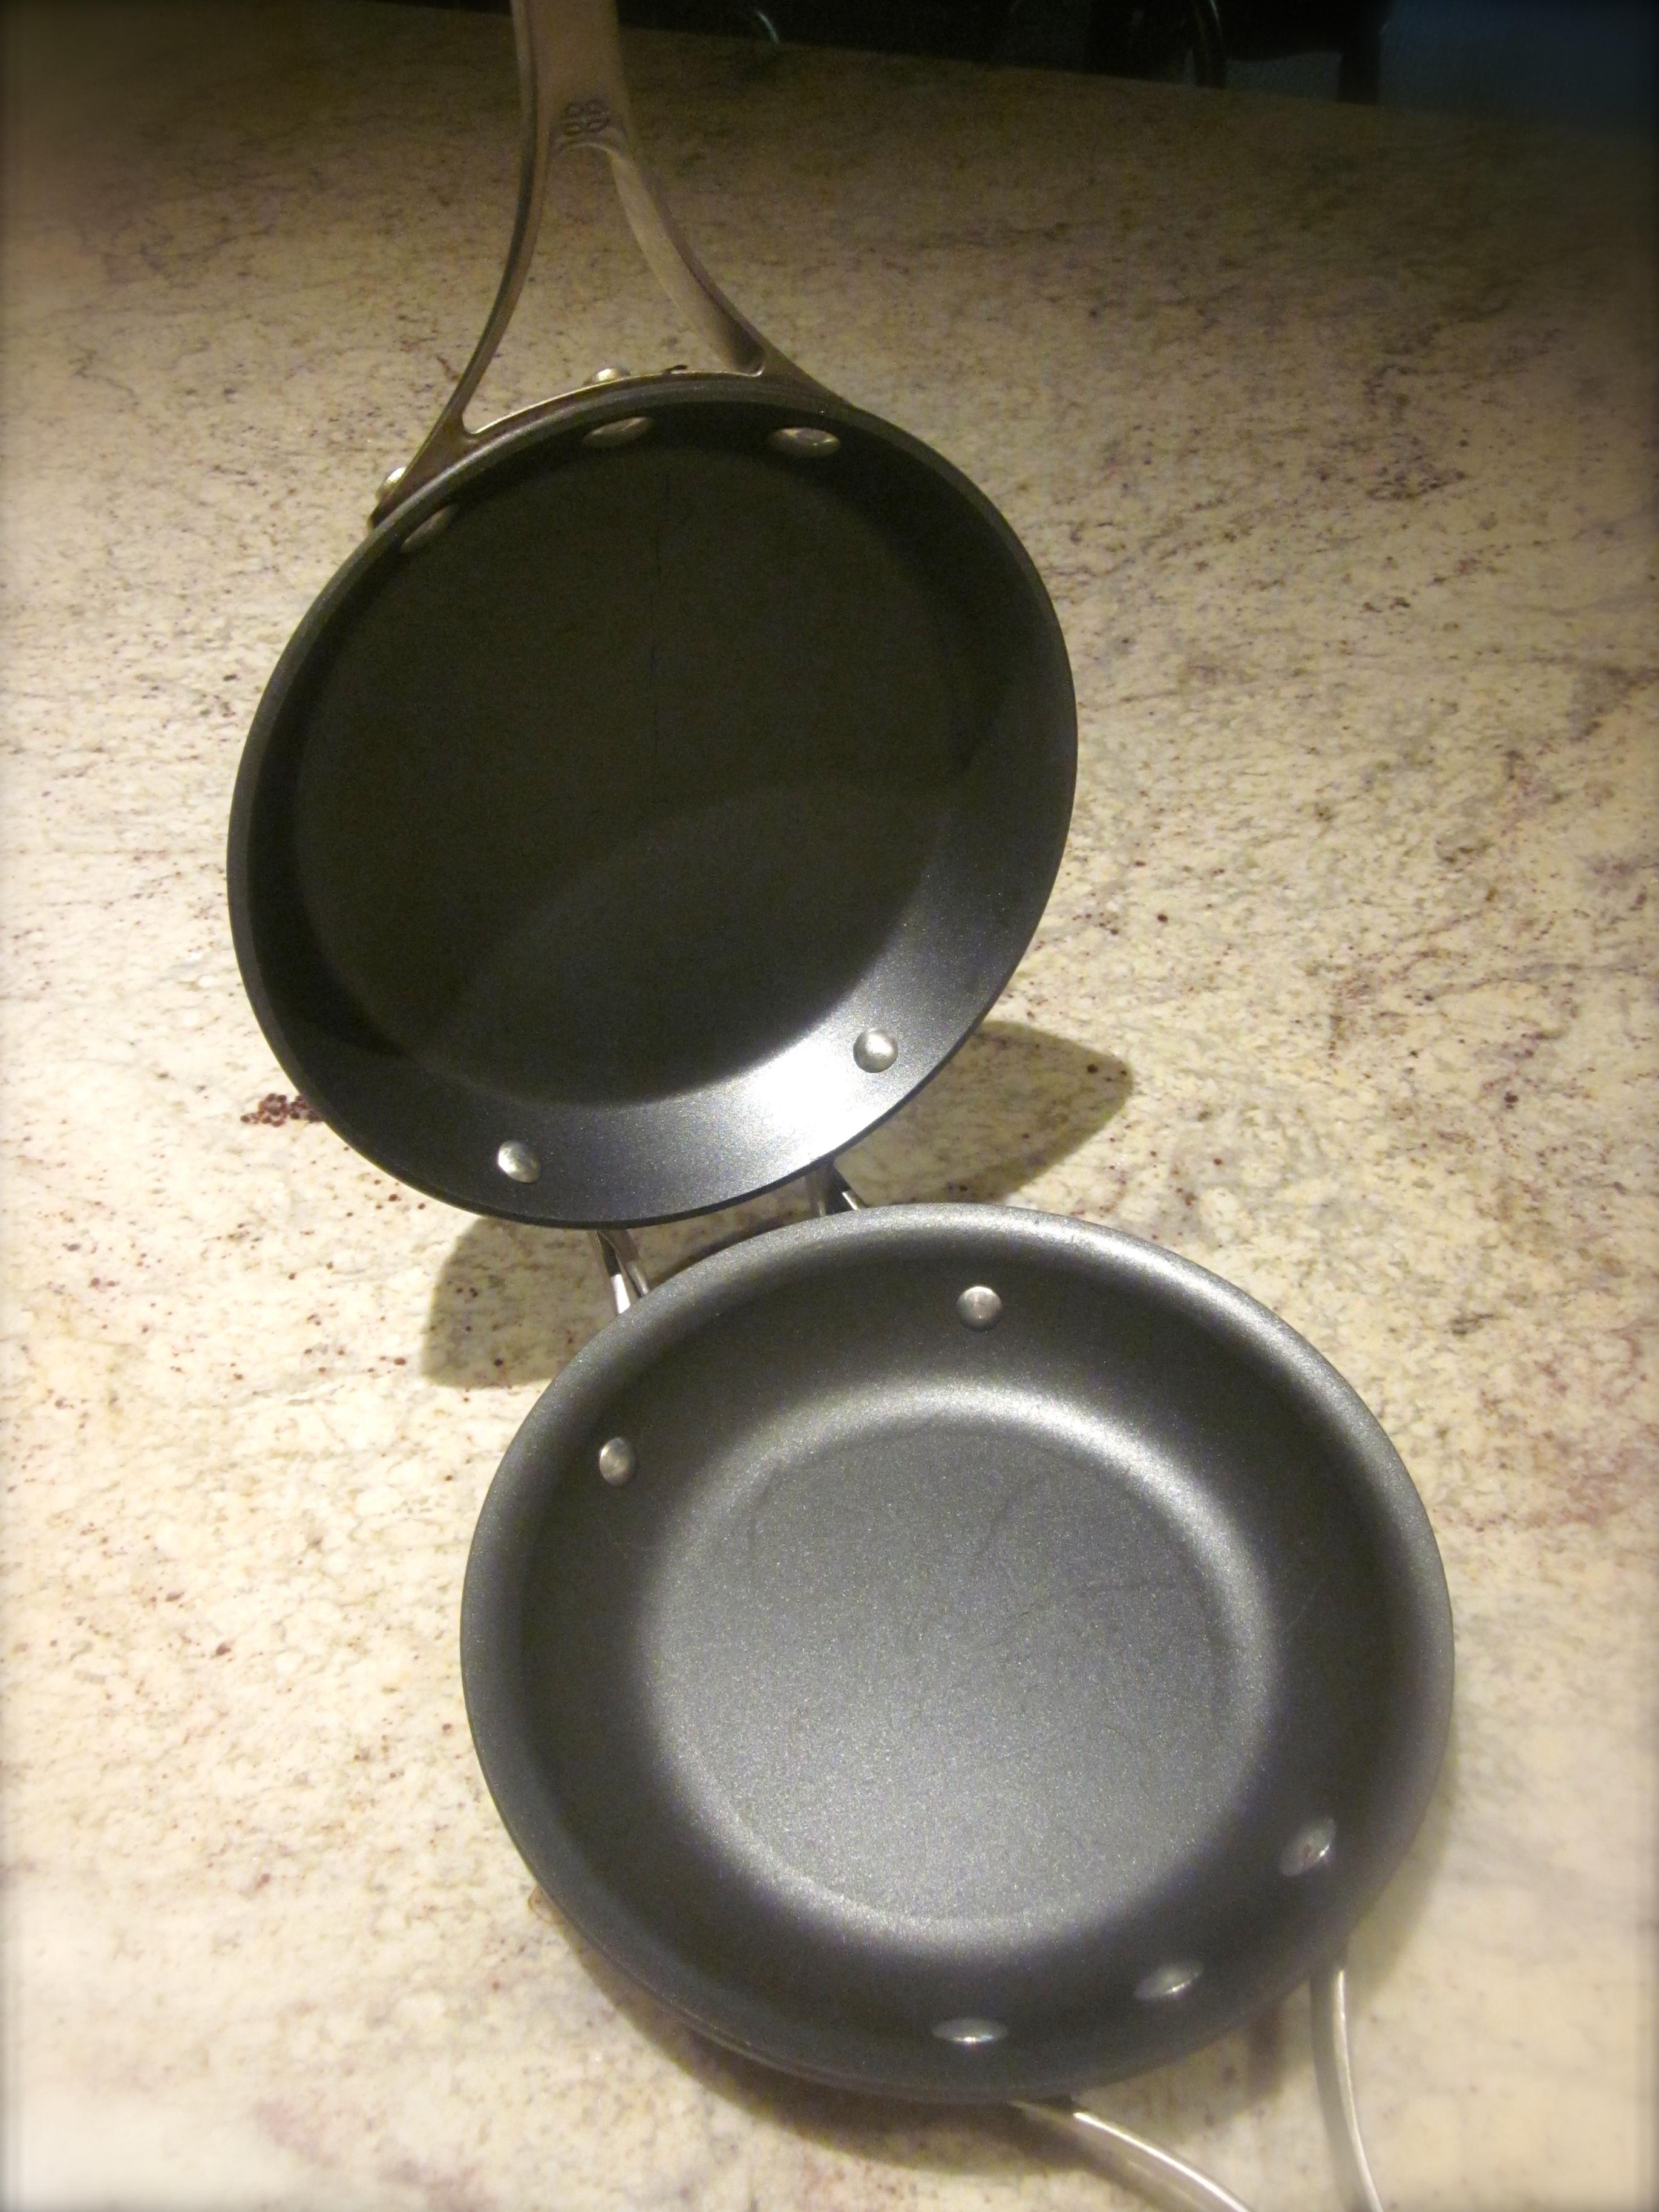 My Calphalon Fritatta pans